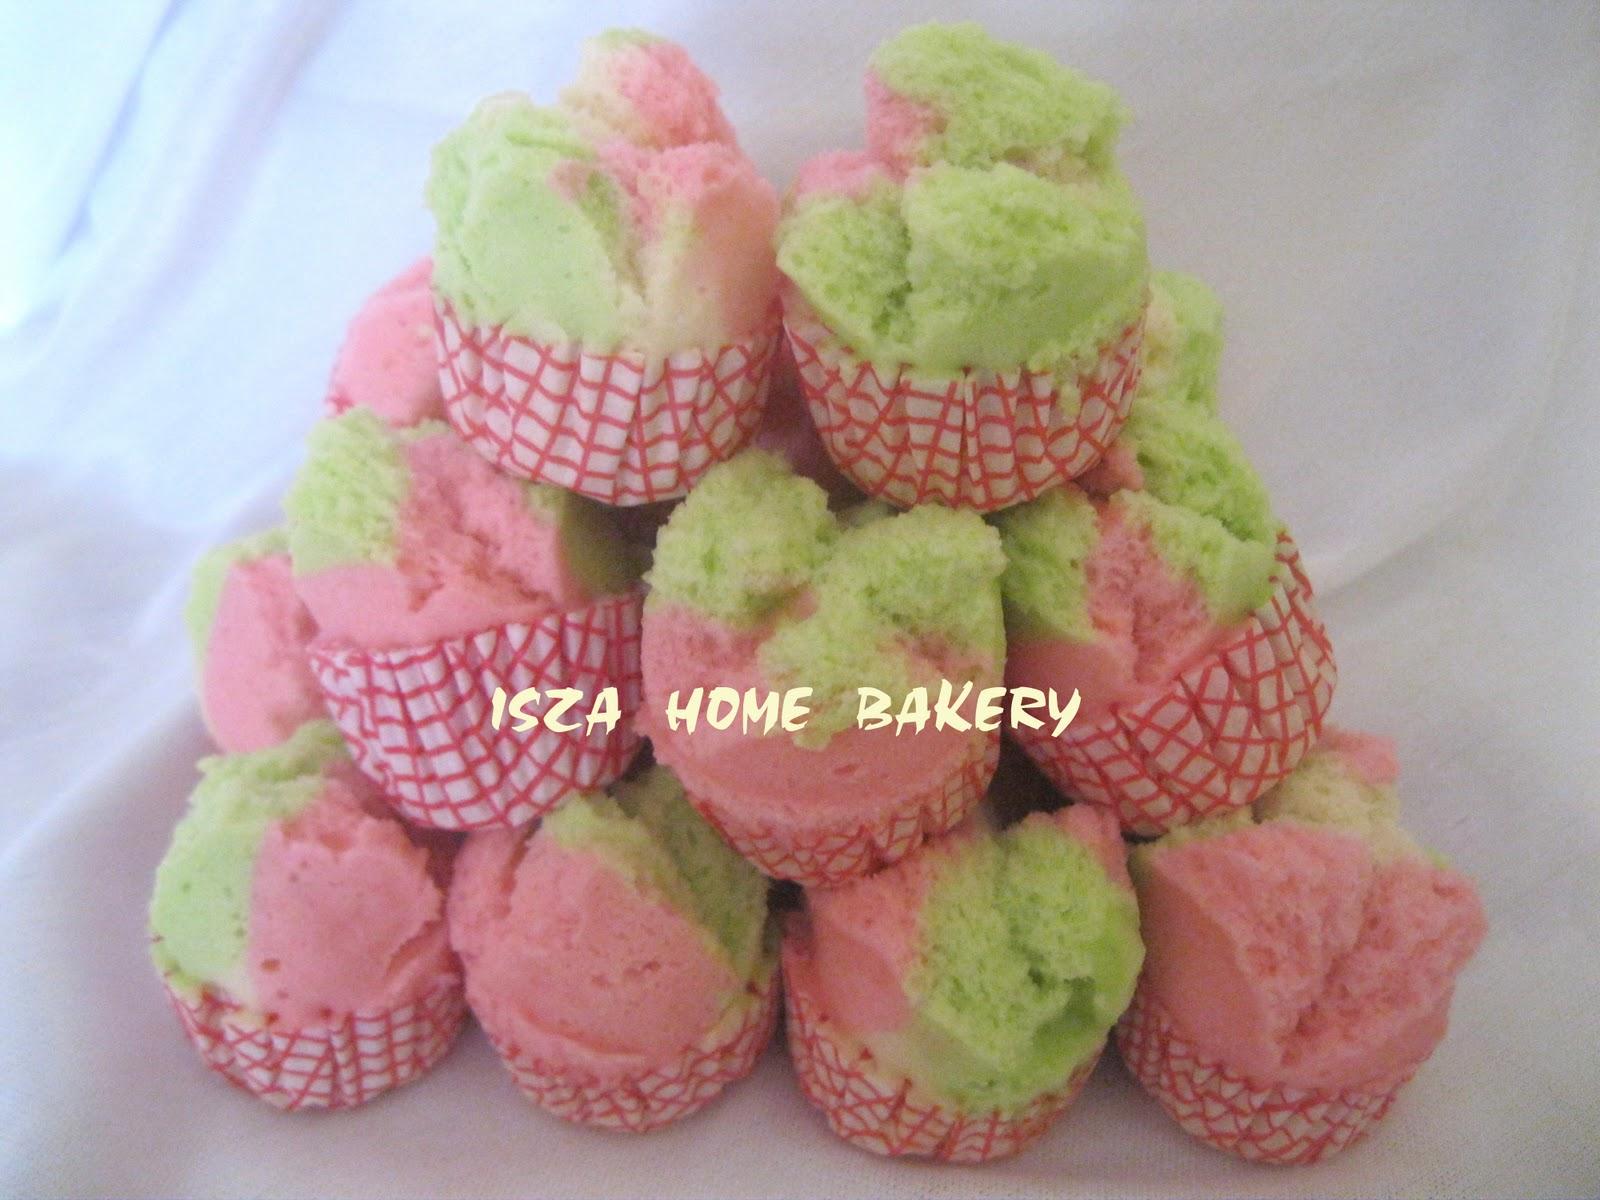 Kuih muih isza home bakery Home mekar